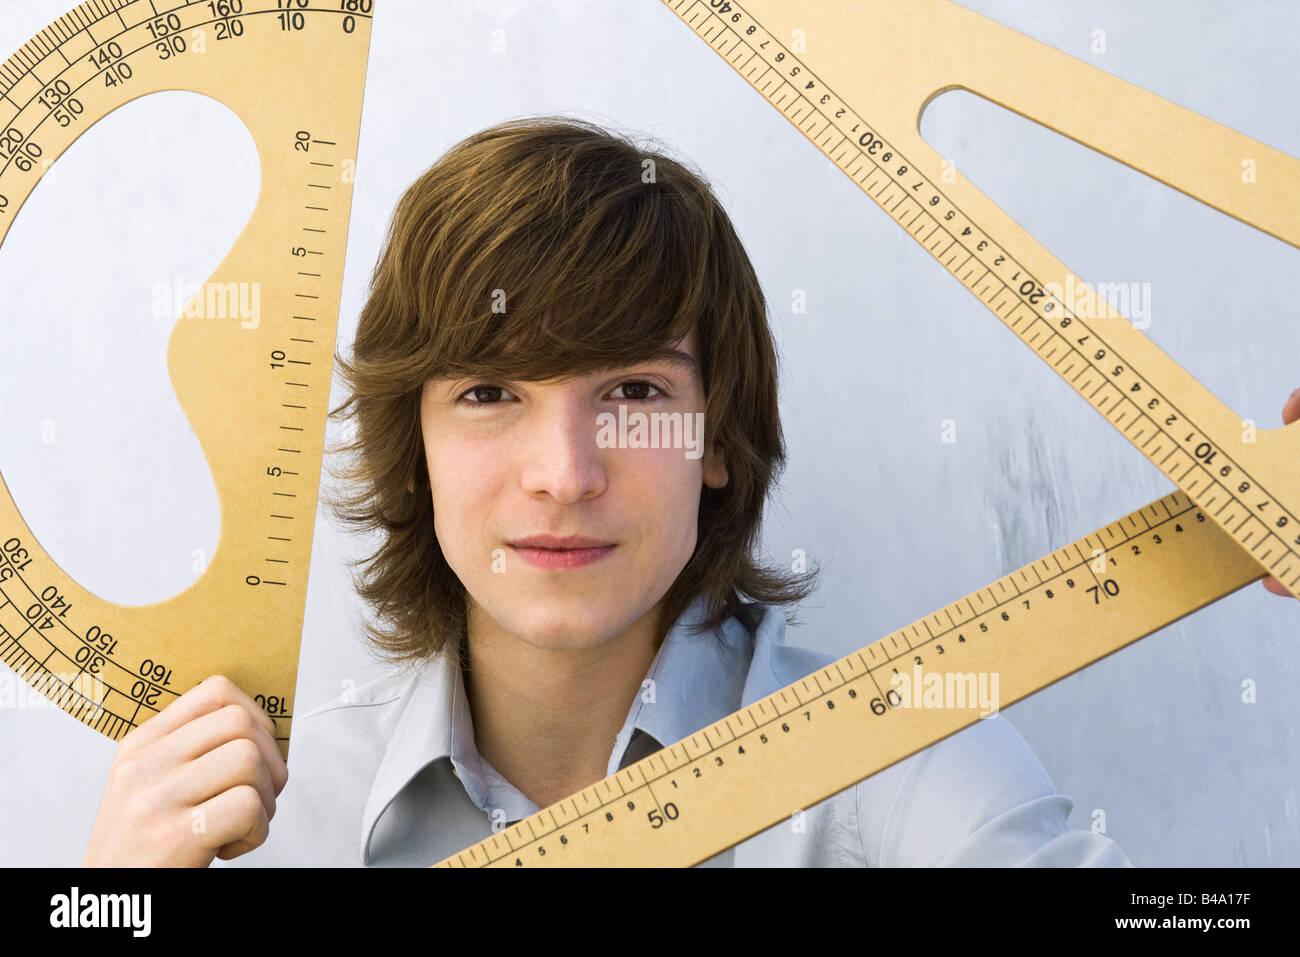 Young man holding various measuring instruments, smiling at camera - Stock Image